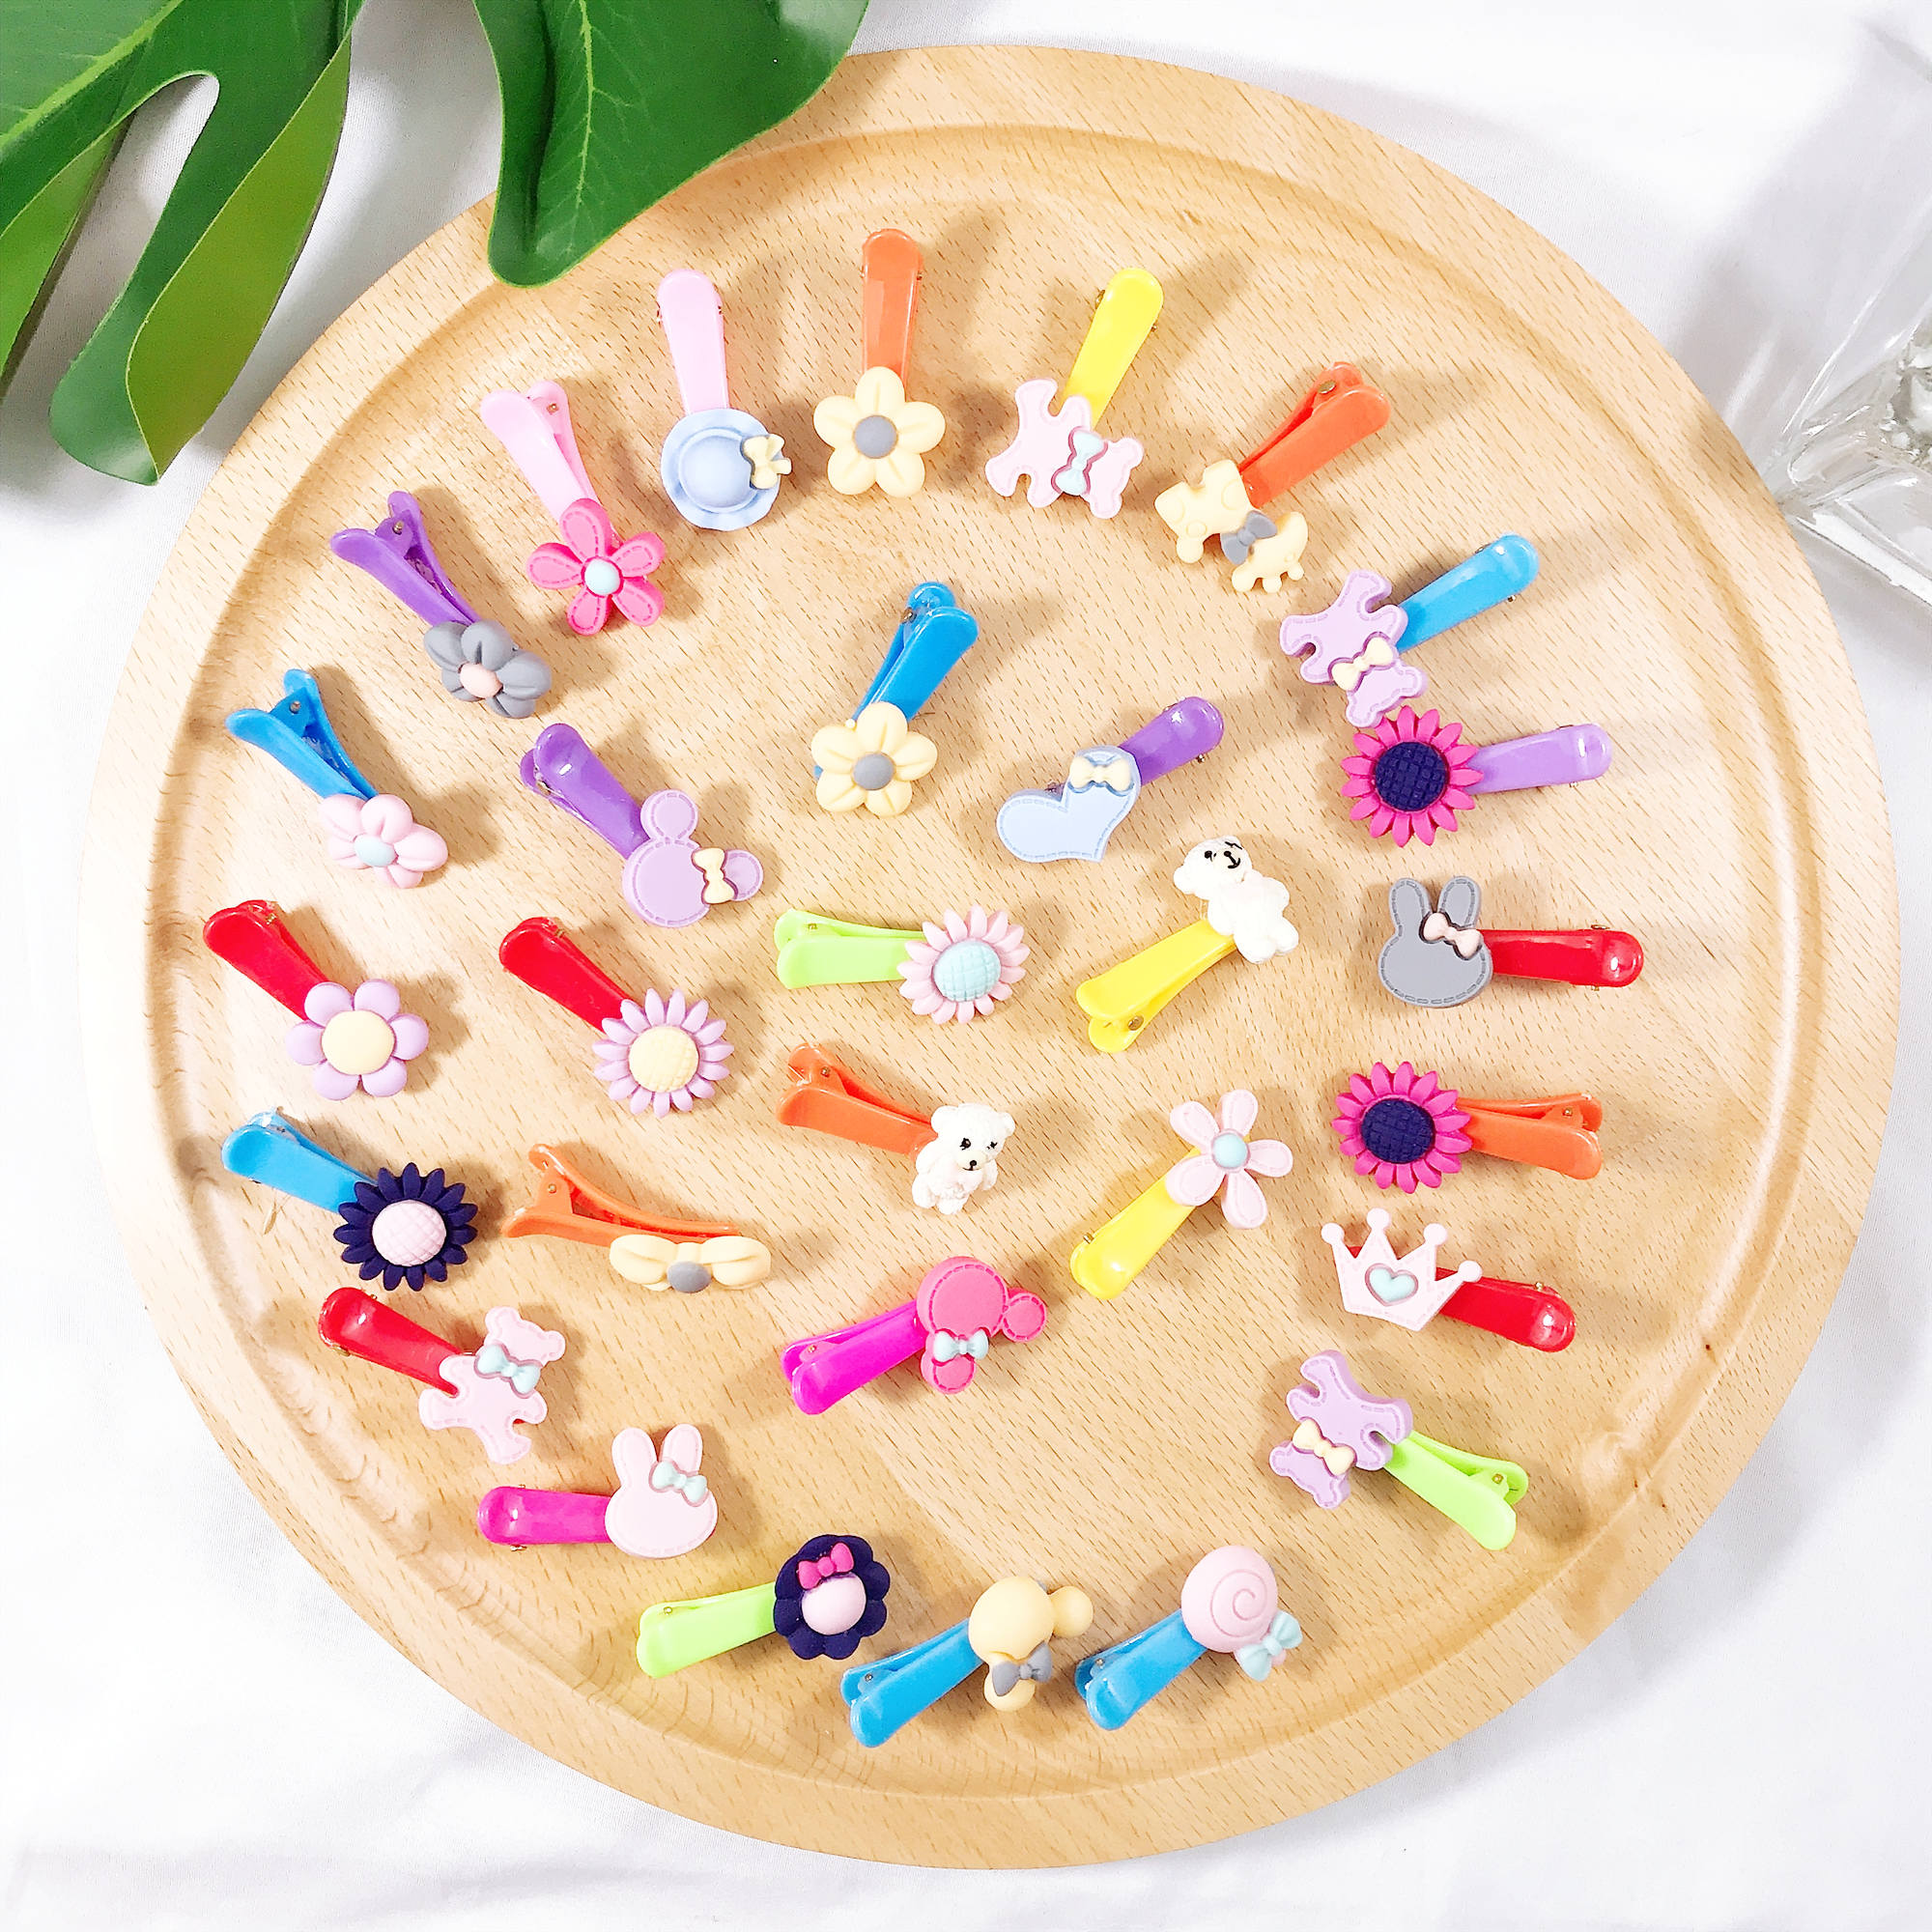 20PCS  Mix Cartoon Bow Knot Rabbit Hair Accessories Set Hair Clip For Girl BB Clip Mini Headbands Children Girl Accessories